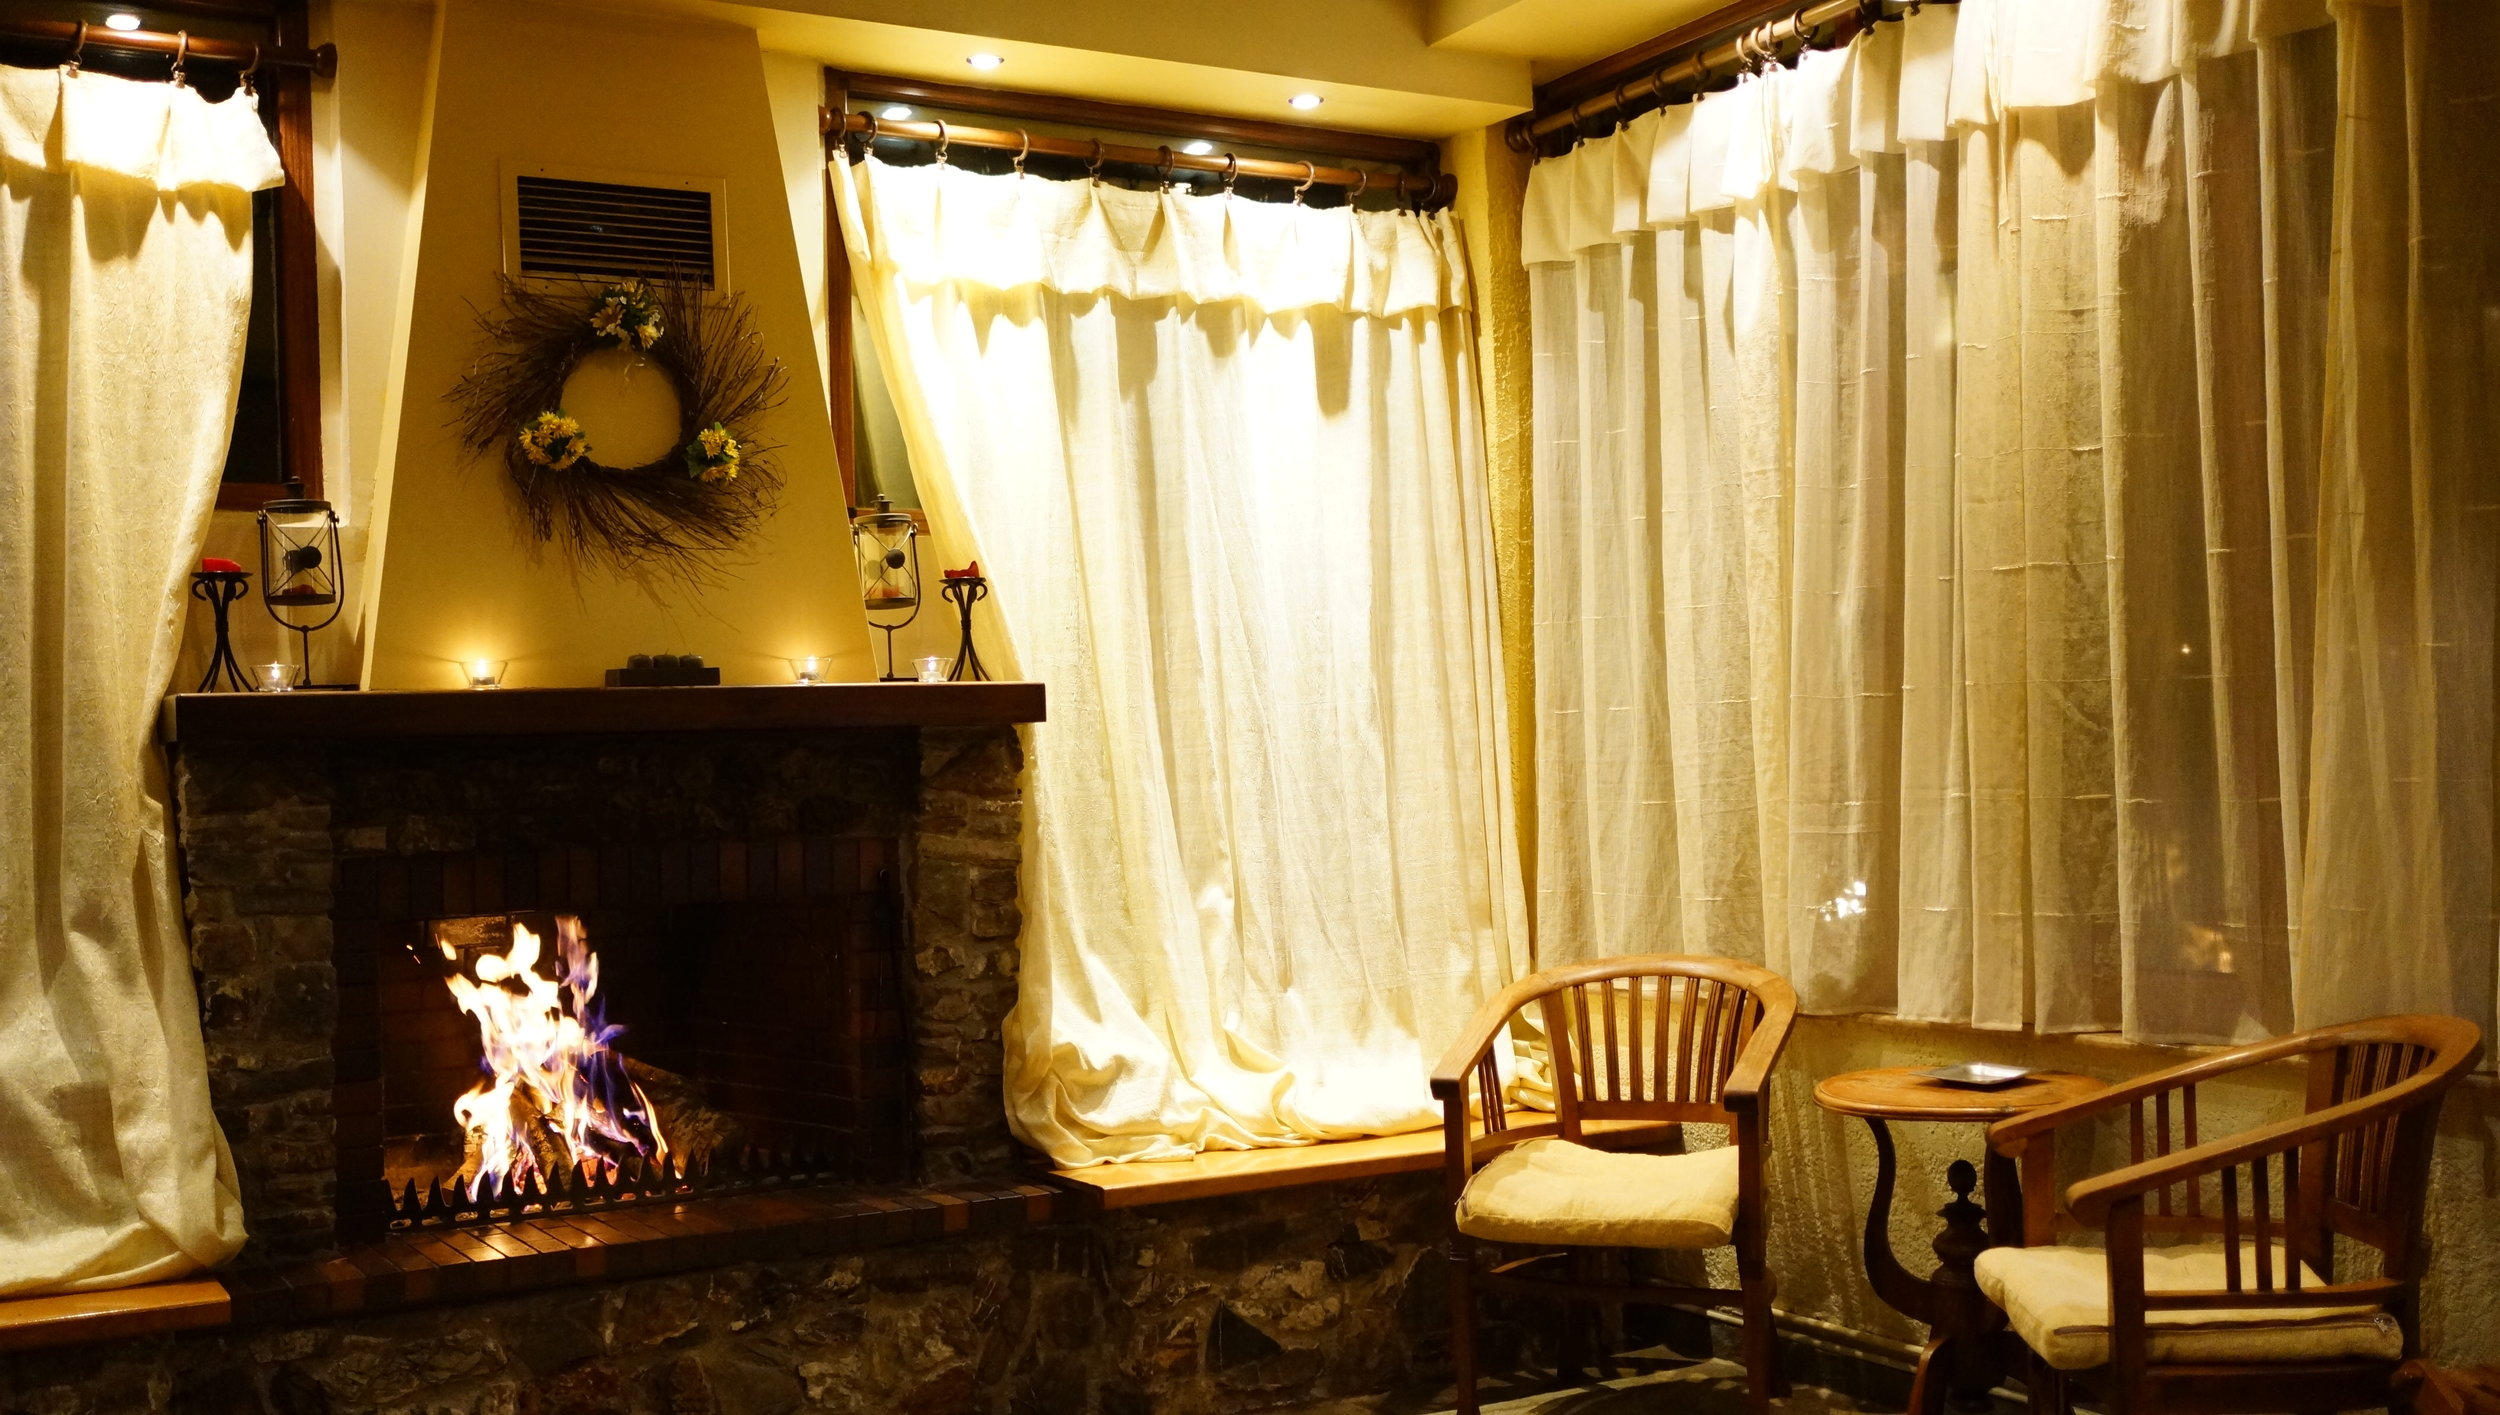 hotel fireplace.JPG